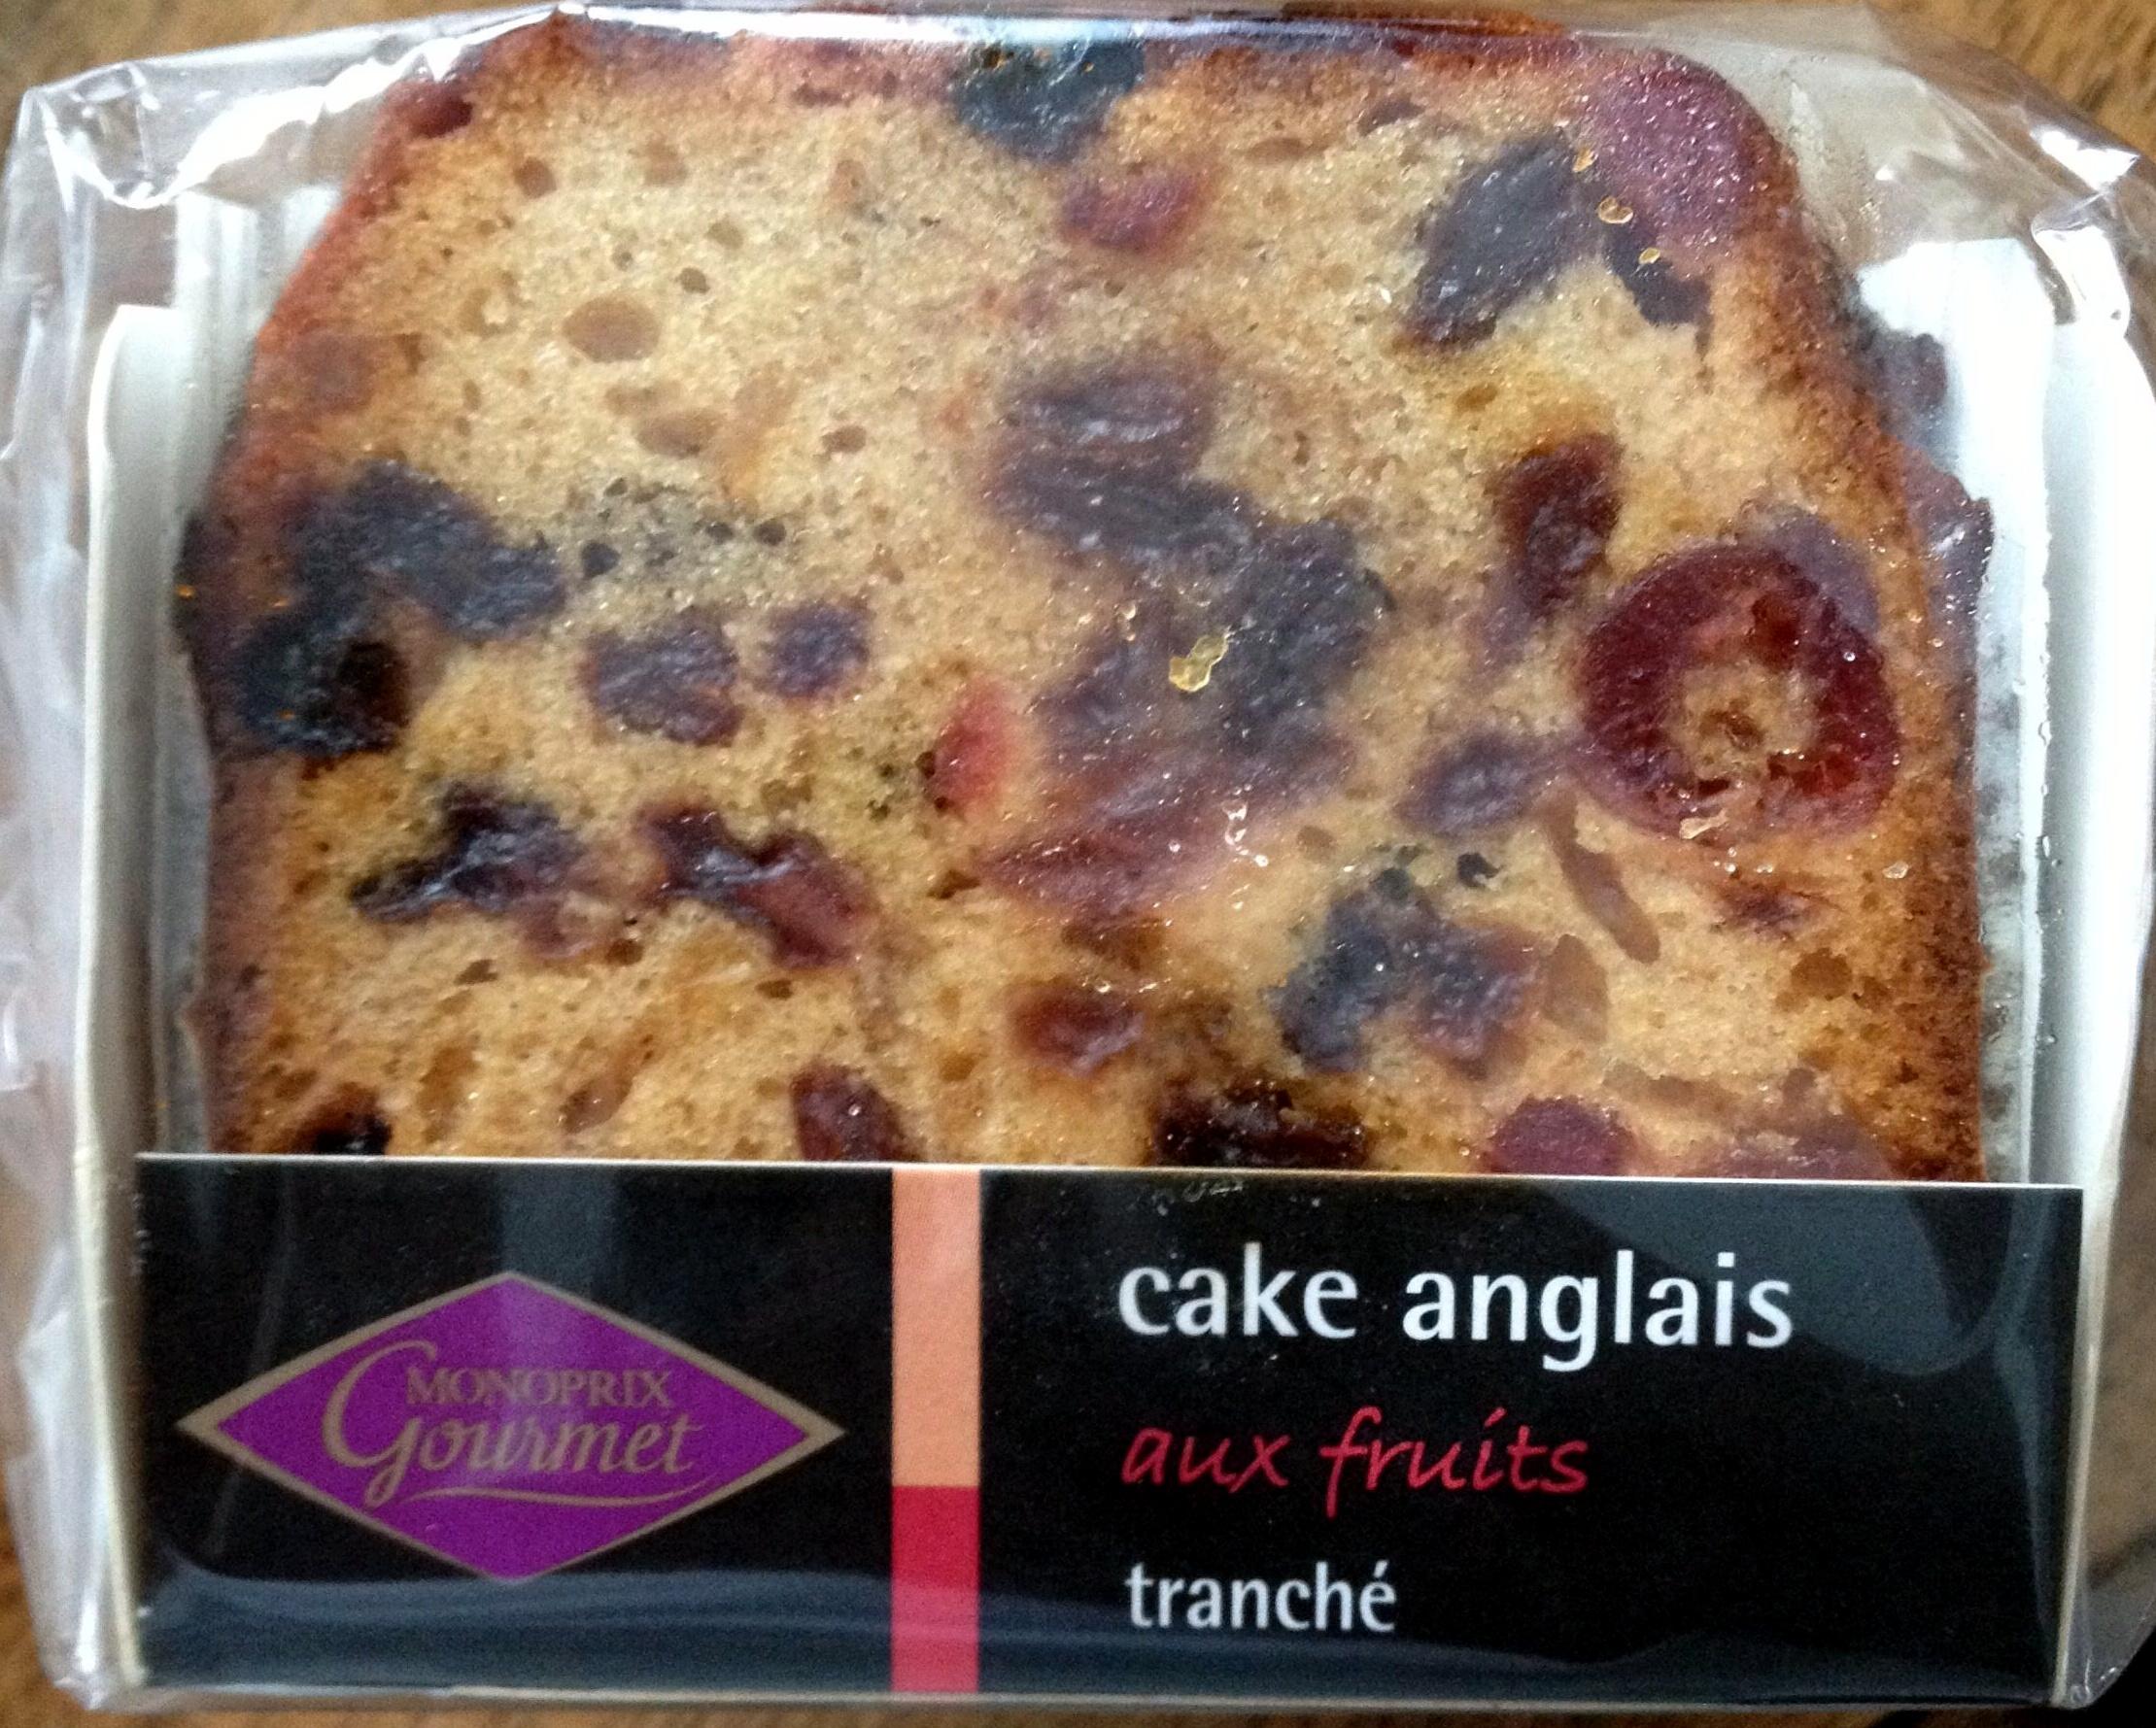 Cake anglais aux fruits tranché - Product